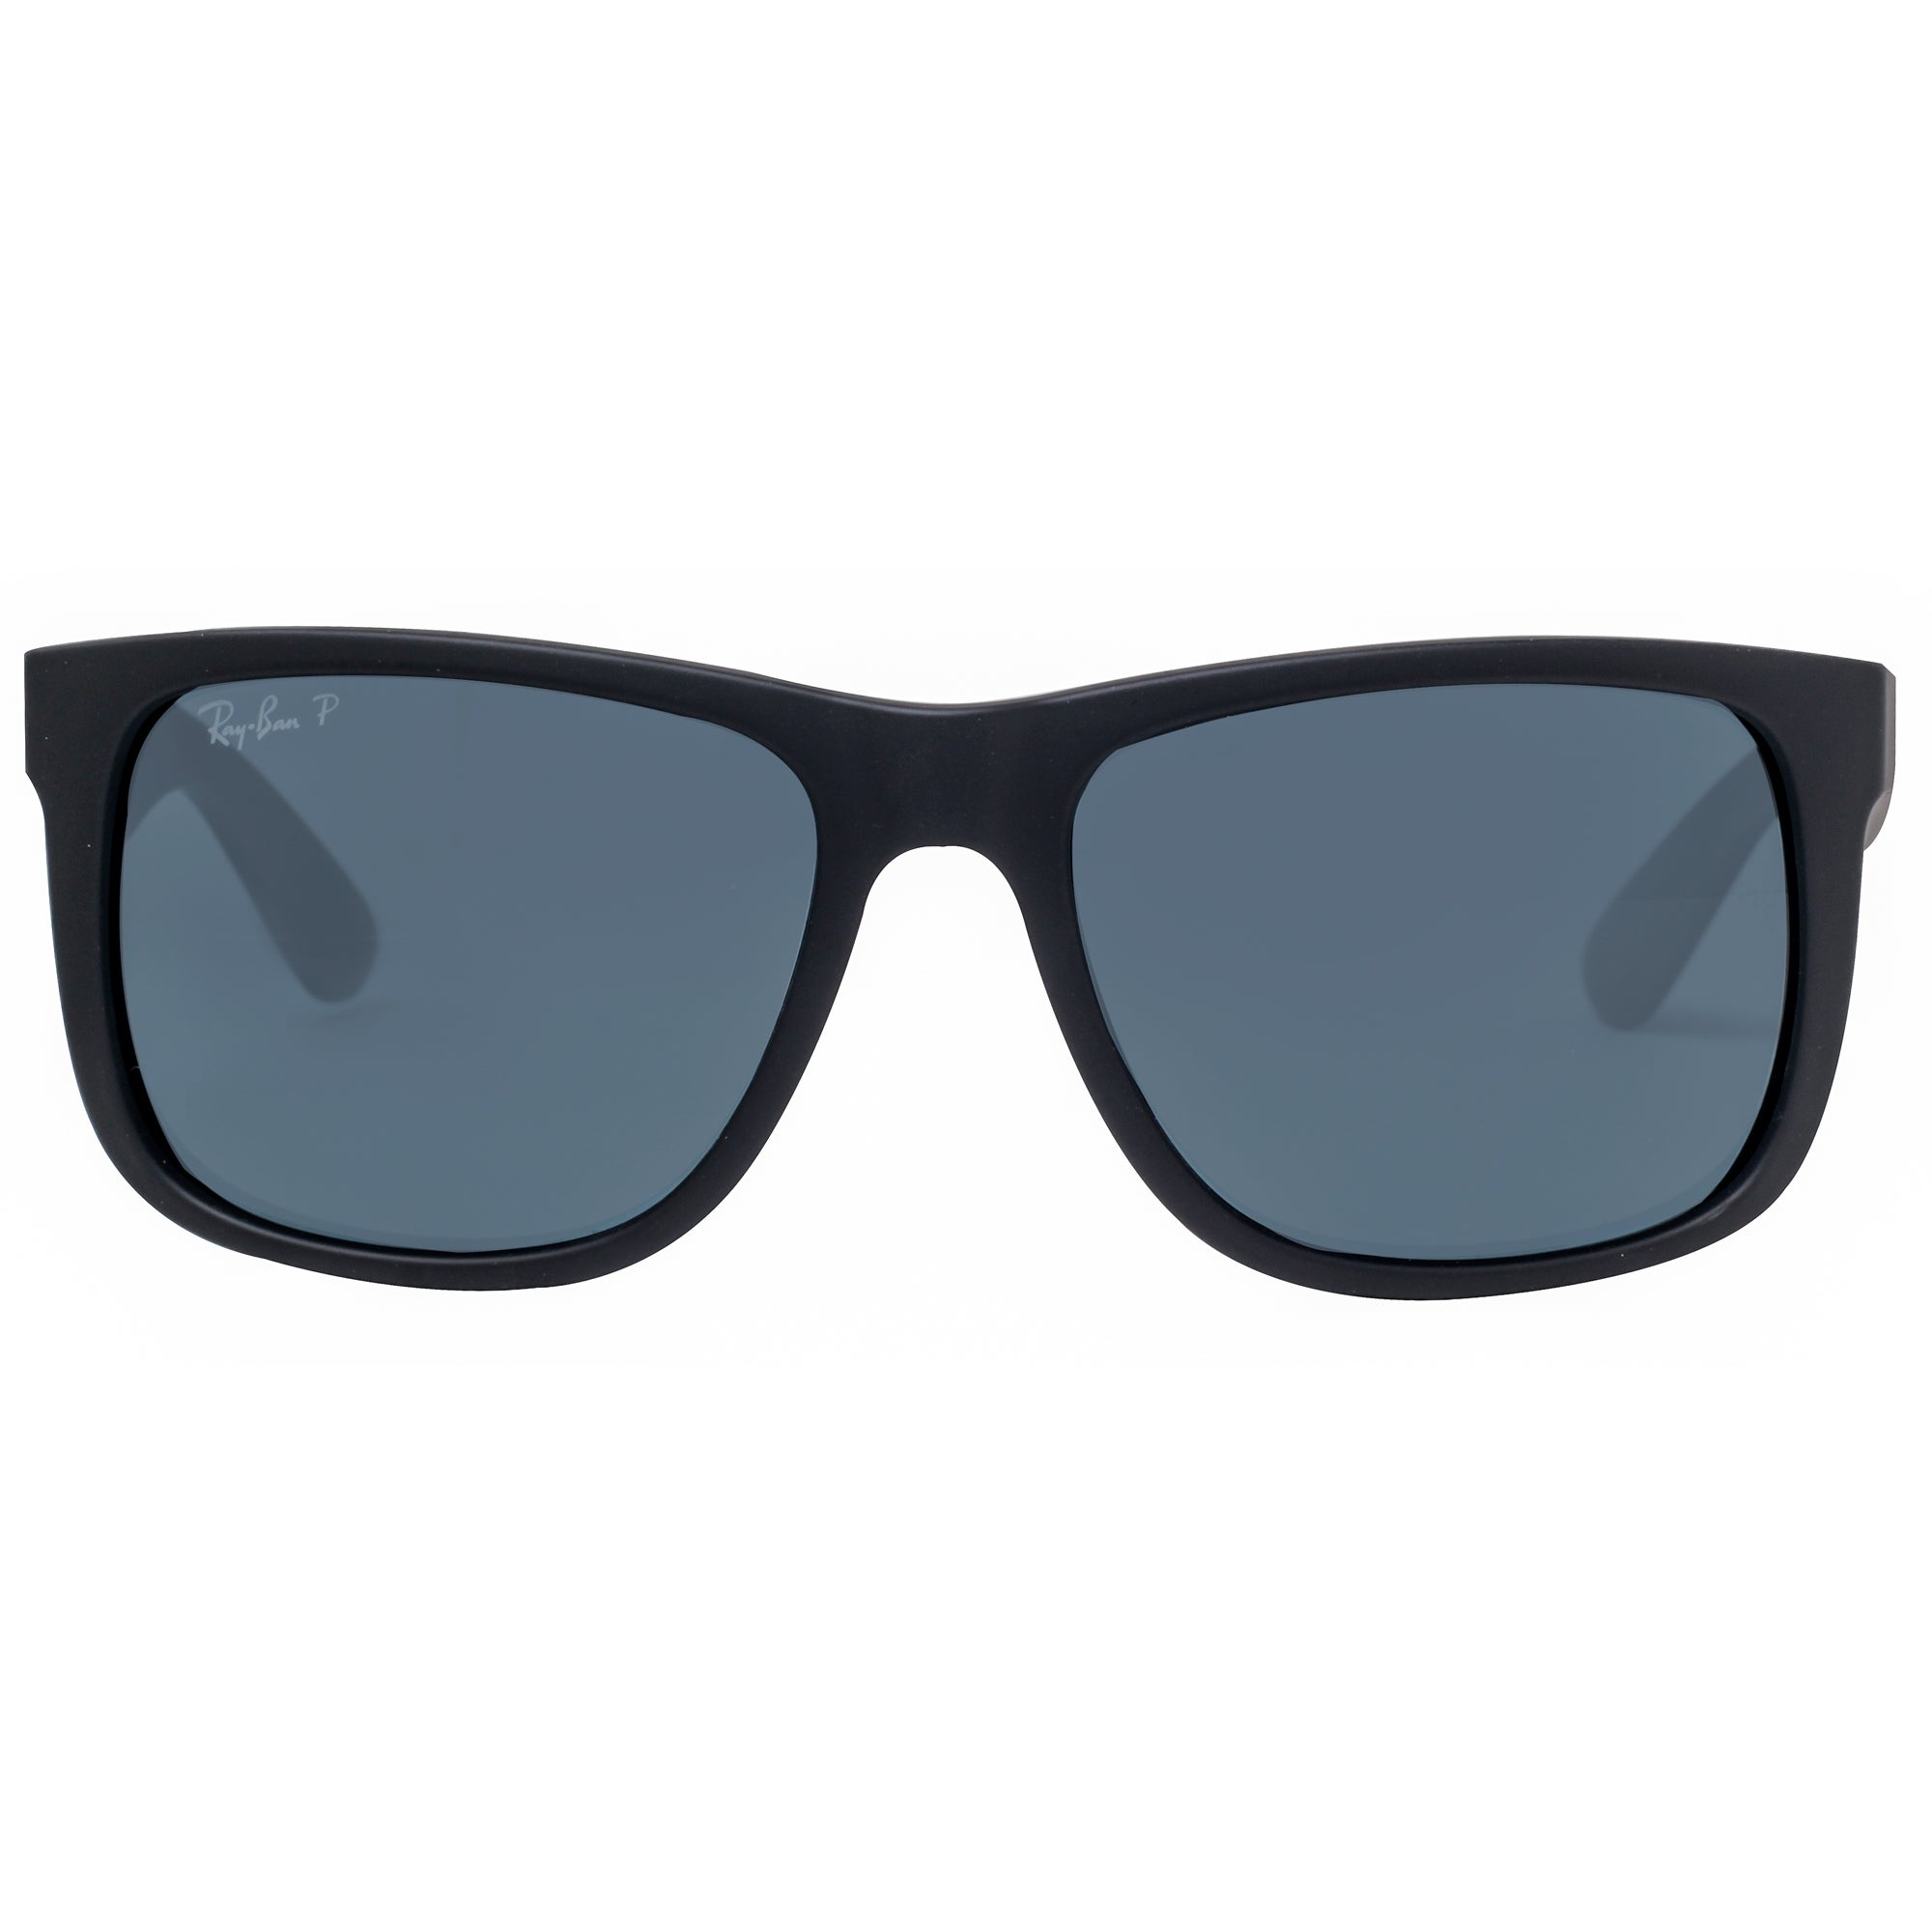 d35bdfd64e2 ... spain shop ray ban justin rb4165 622 2v 54mm matte black polarized blue  classic sunglasses matte